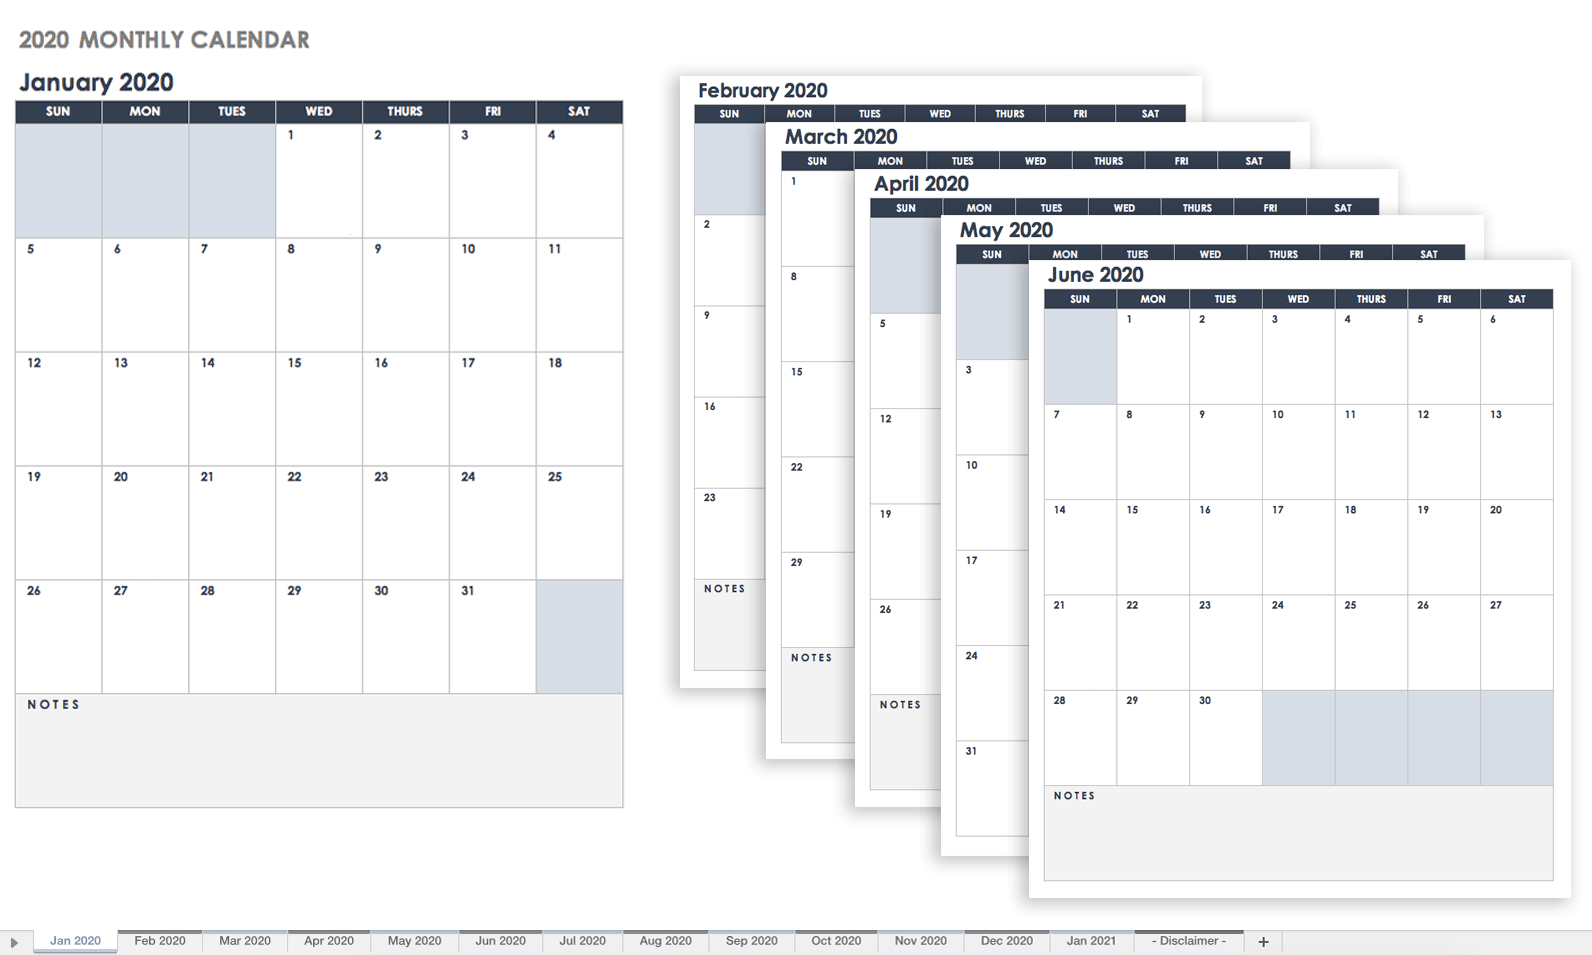 Free Google Calendar Templates | Smartsheet in Google Calendar Printable 2019 2020